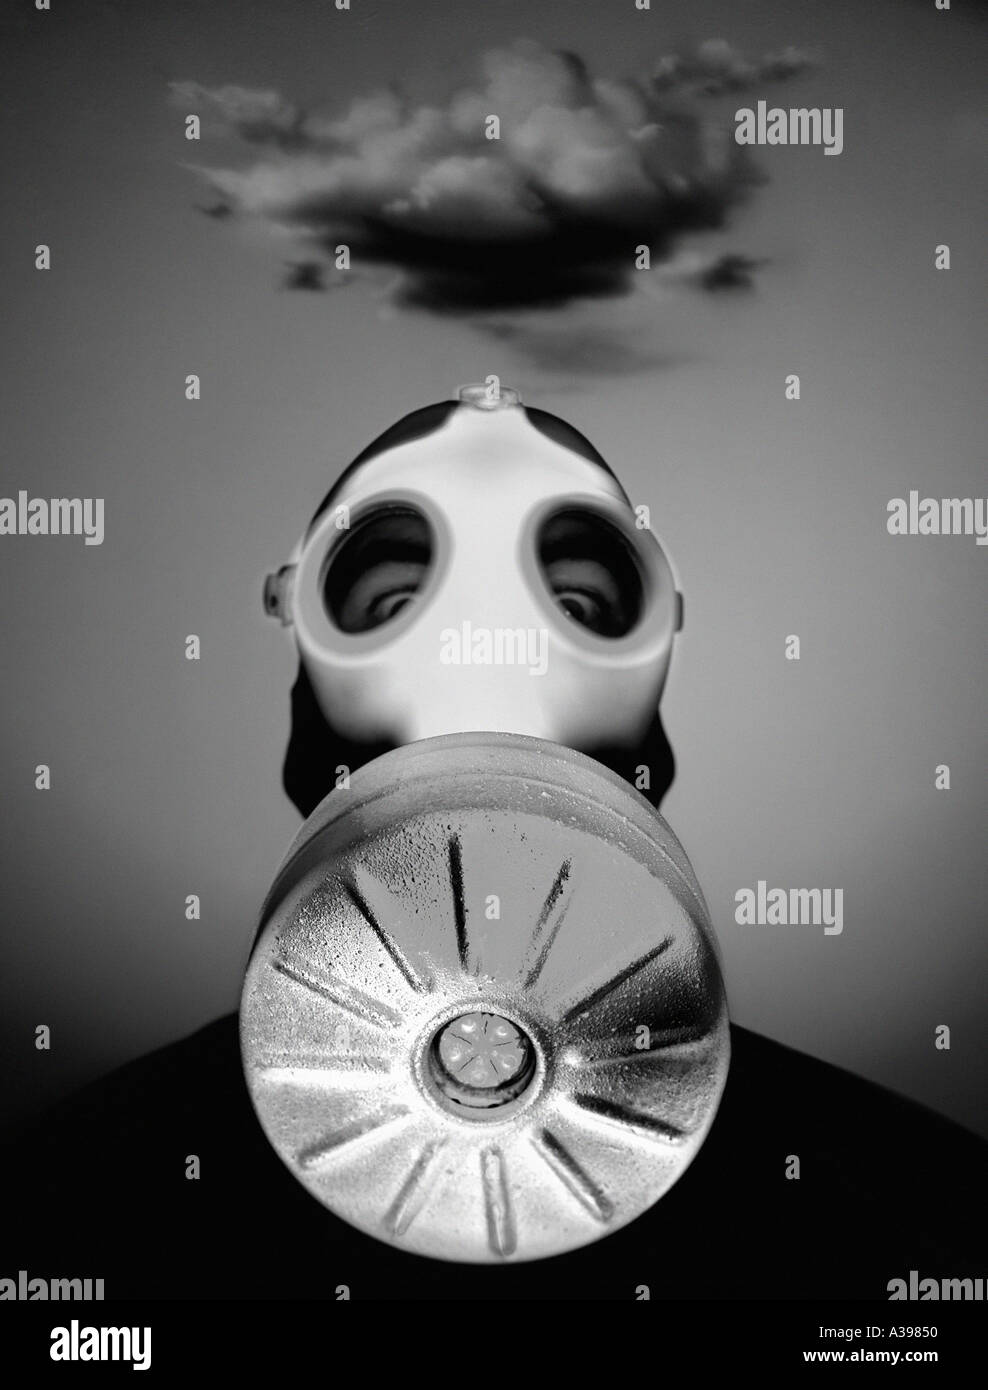 masque à gaz Photo Stock